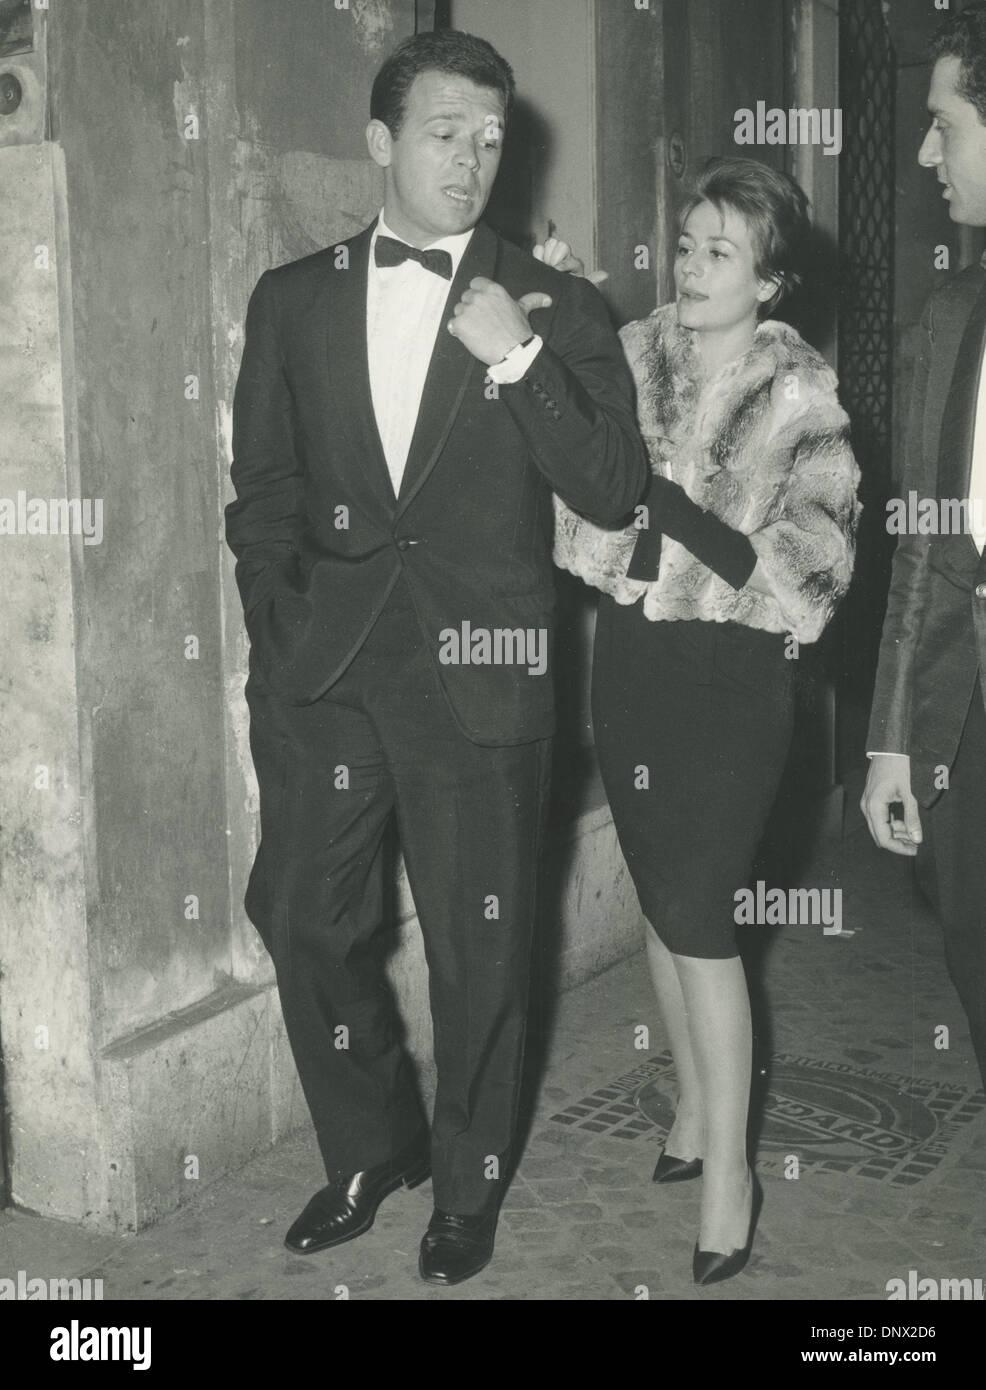 "Oct 06, 1962 - Rome, Italy - RENATO SALVATORI and his wife ANNIE GIRARDOT attend the premiere of the film ""Sodoma and Gomorra"". (Credit Image: © KEYSTONE Pictures/ZUMAPRESS.com) Stock Photo"